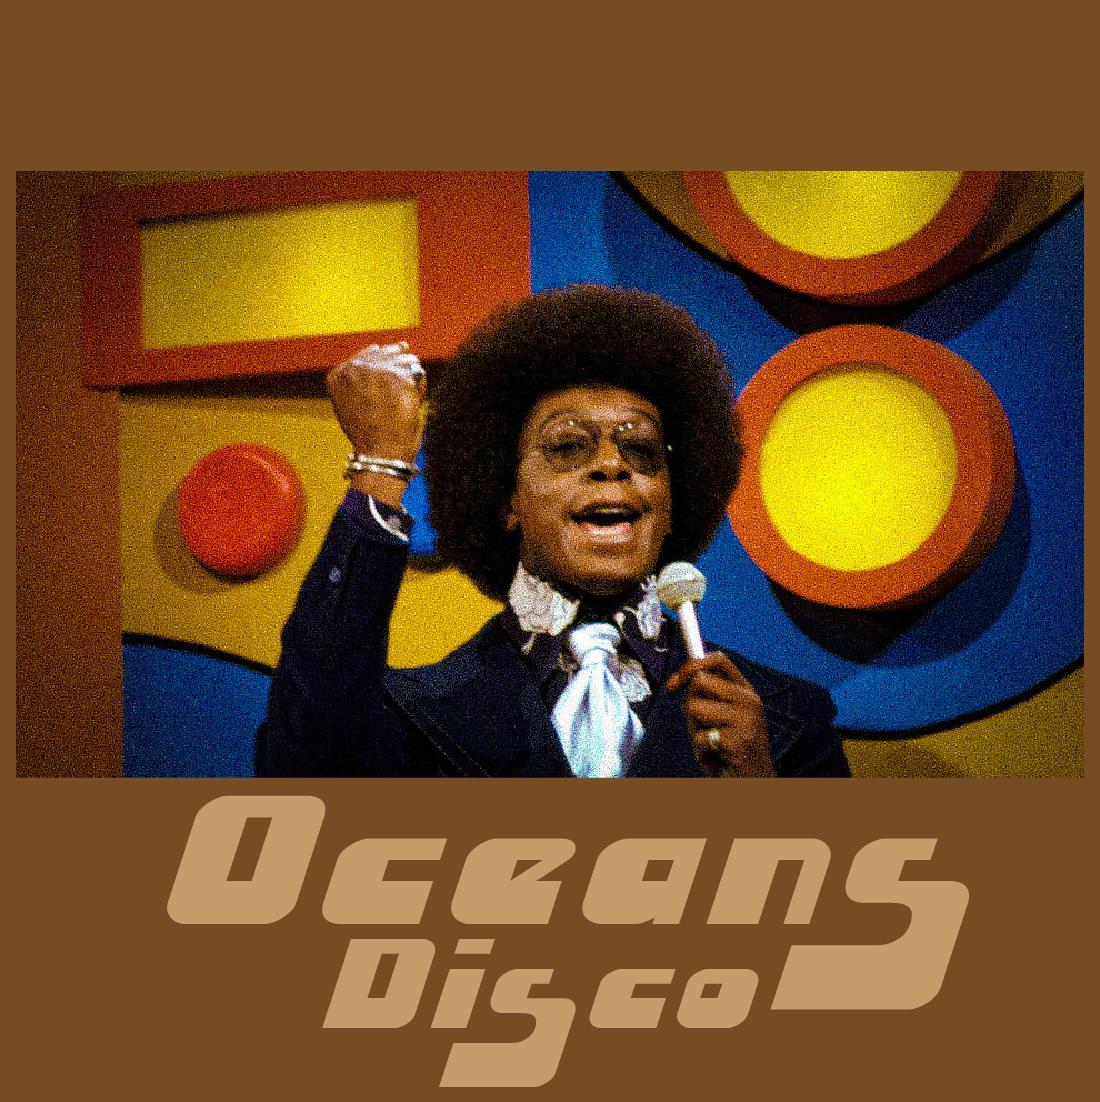 Oceans Disco (3).png